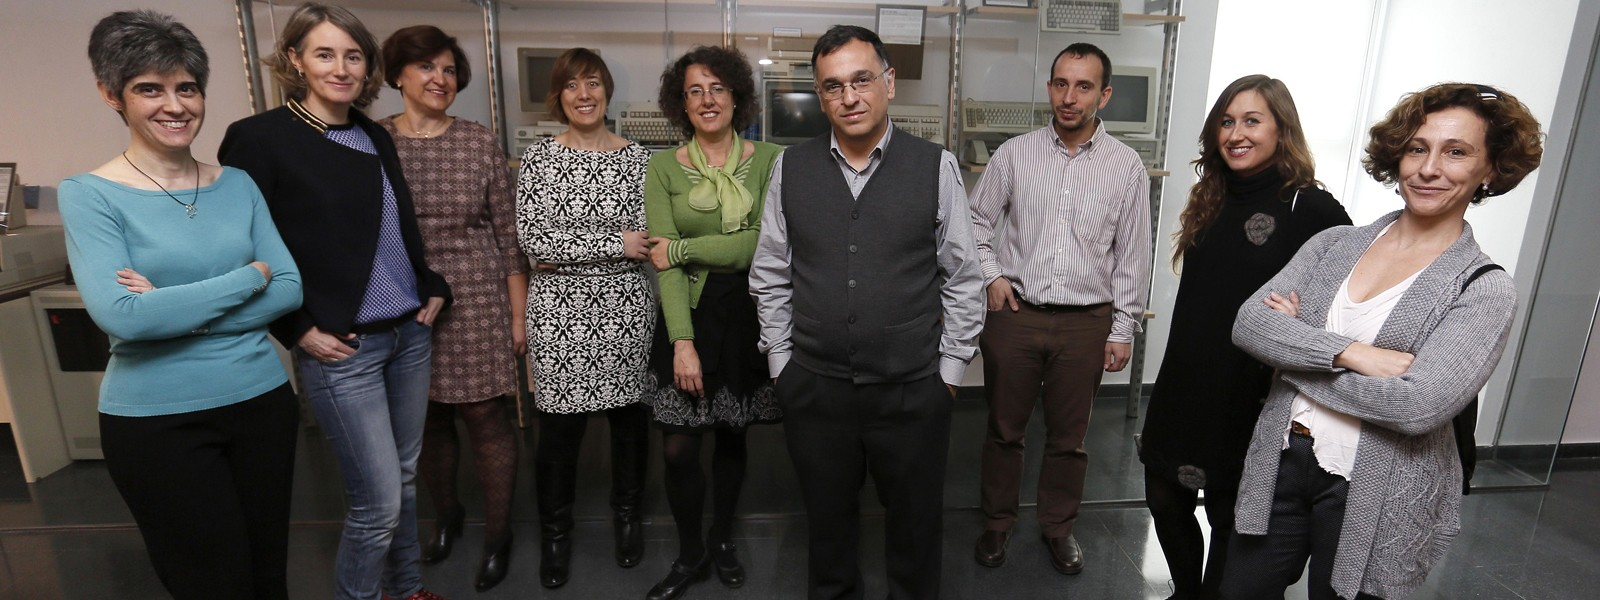 FBBVA-Ayudas-Equipos-2014-Jose-Luis-Sierra